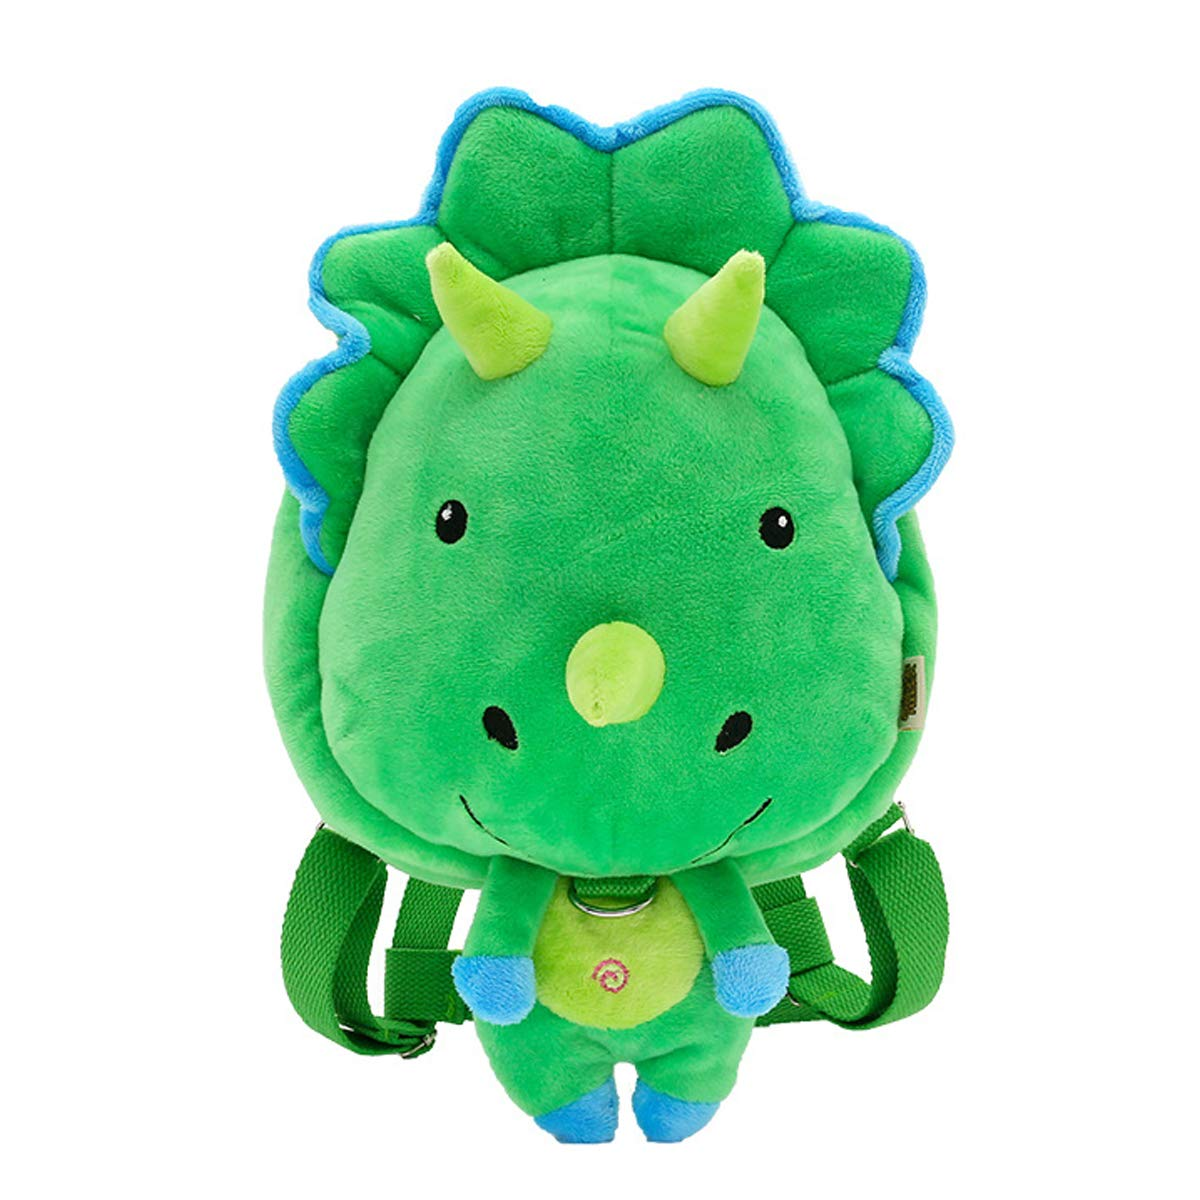 Kanodan ぬいぐるみ 幼稚園 キッズ 恐竜 バックパック アニマル アニメ ミニ スクールバッグ 1-5歳 S グリーン 180152  Triceratop B07GDFL8P2